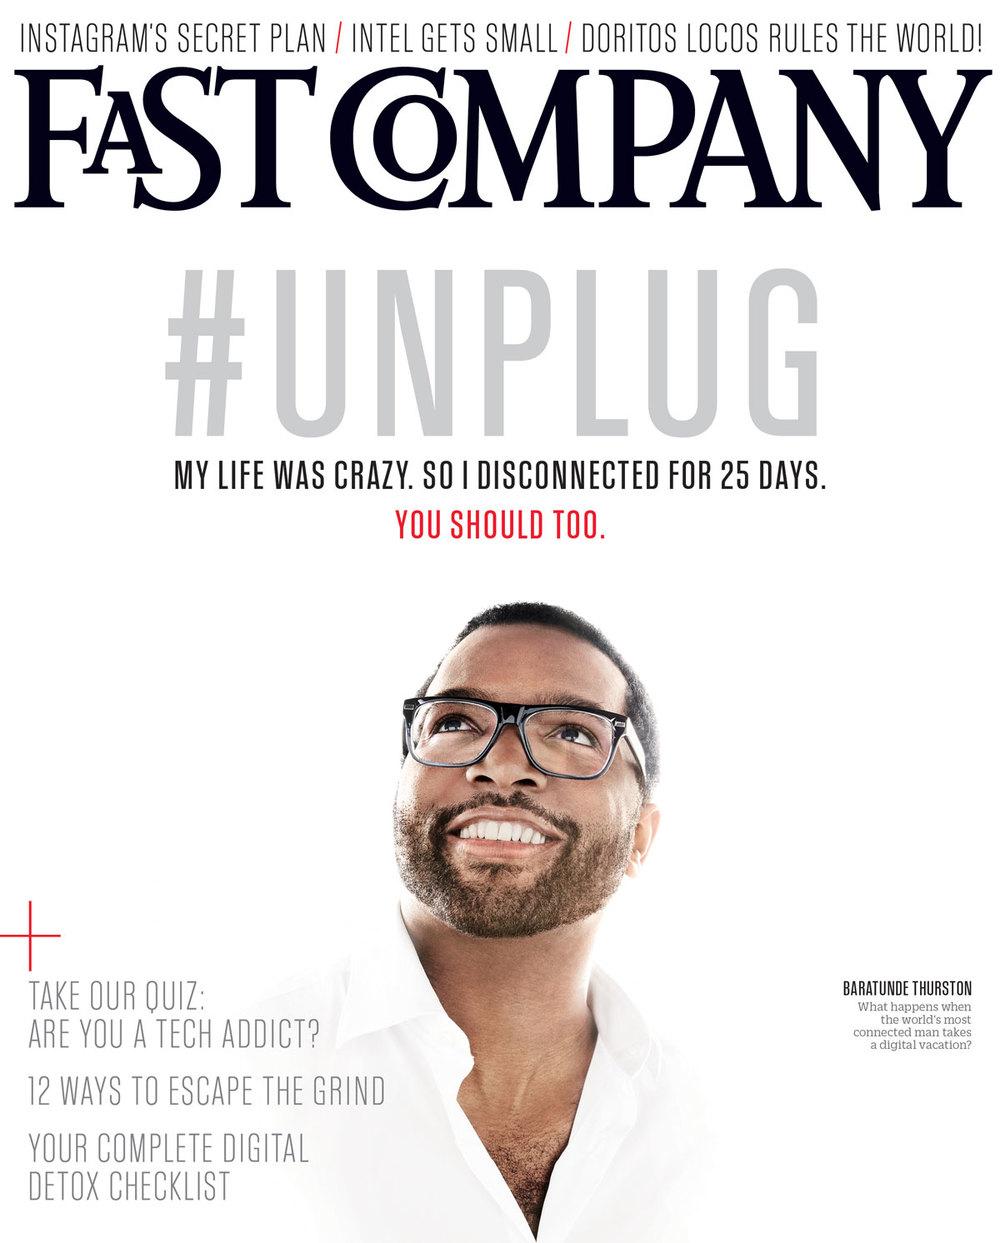 baratunde-fast-company-cover-1200w.jpg